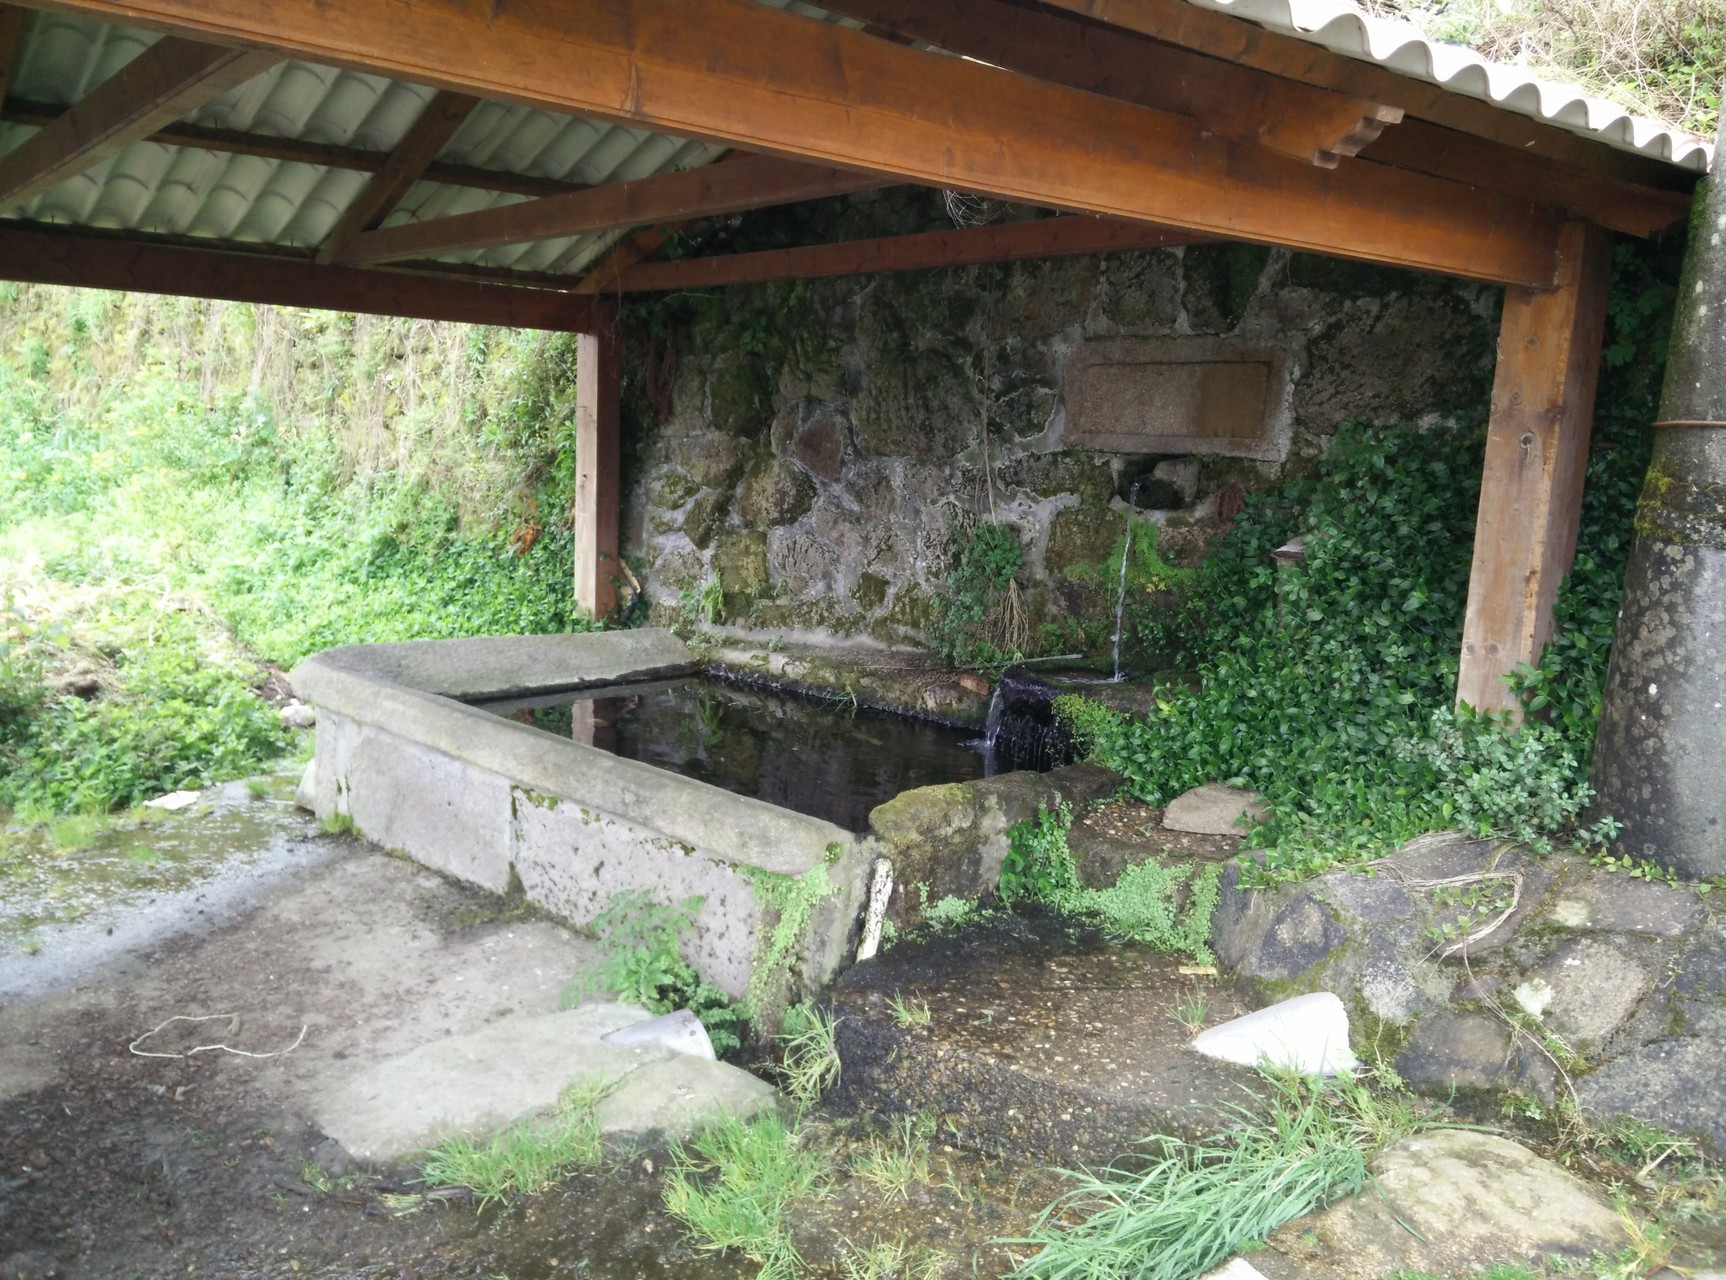 Salcidos (ctra. gral.), A Guarda, Pontevedra